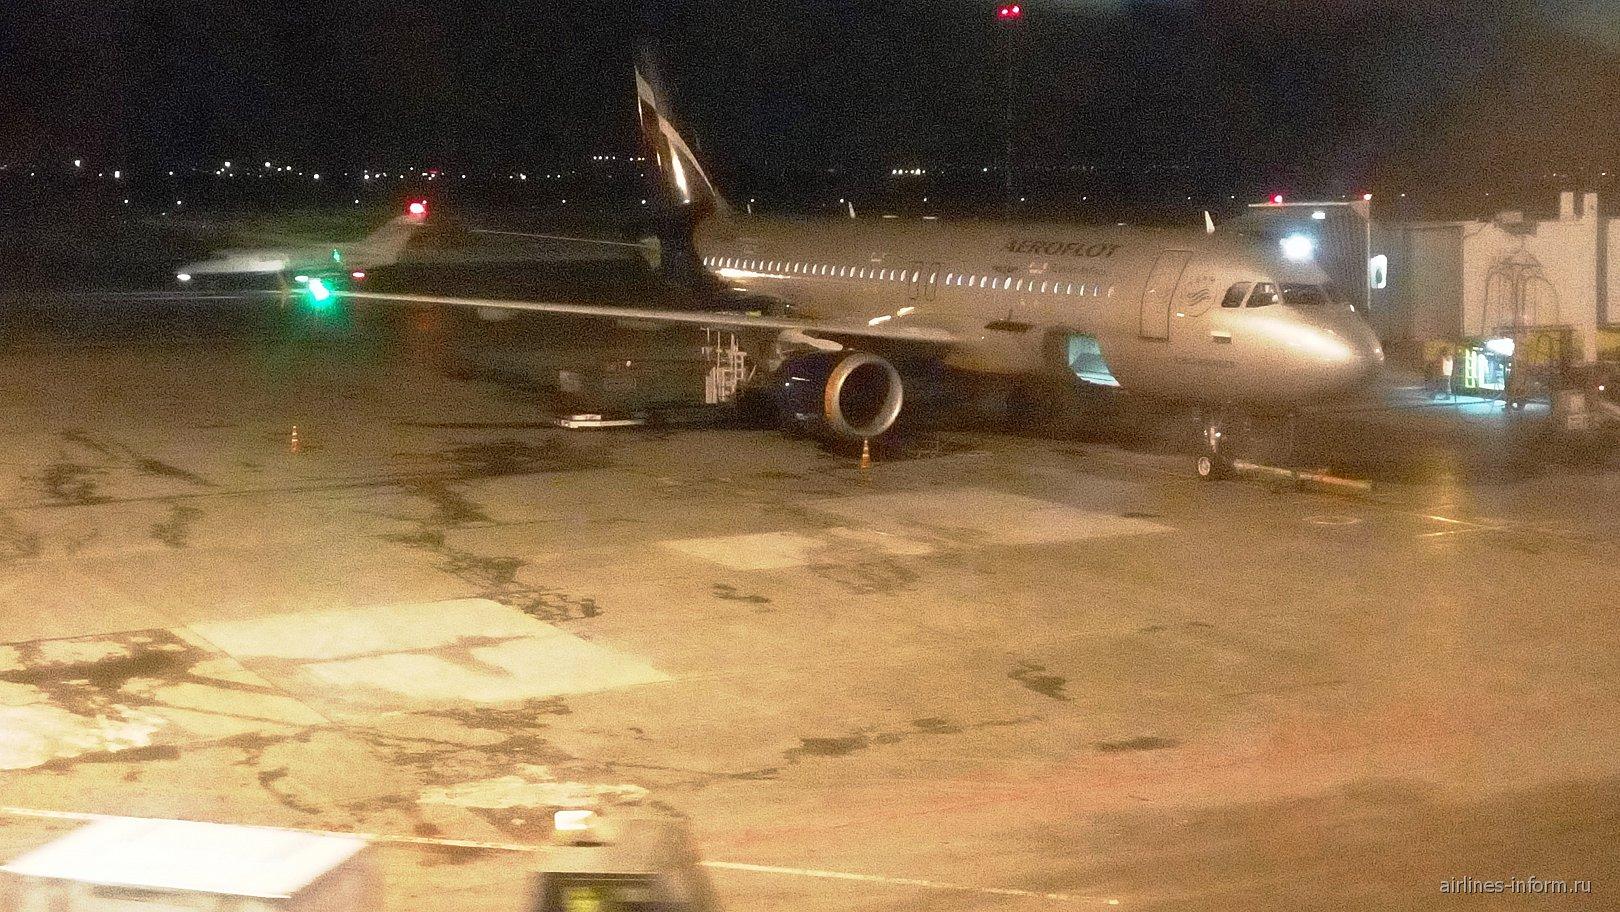 Екатеринбург - Москва на А320 Аэрофлота: летаем за Спасибо